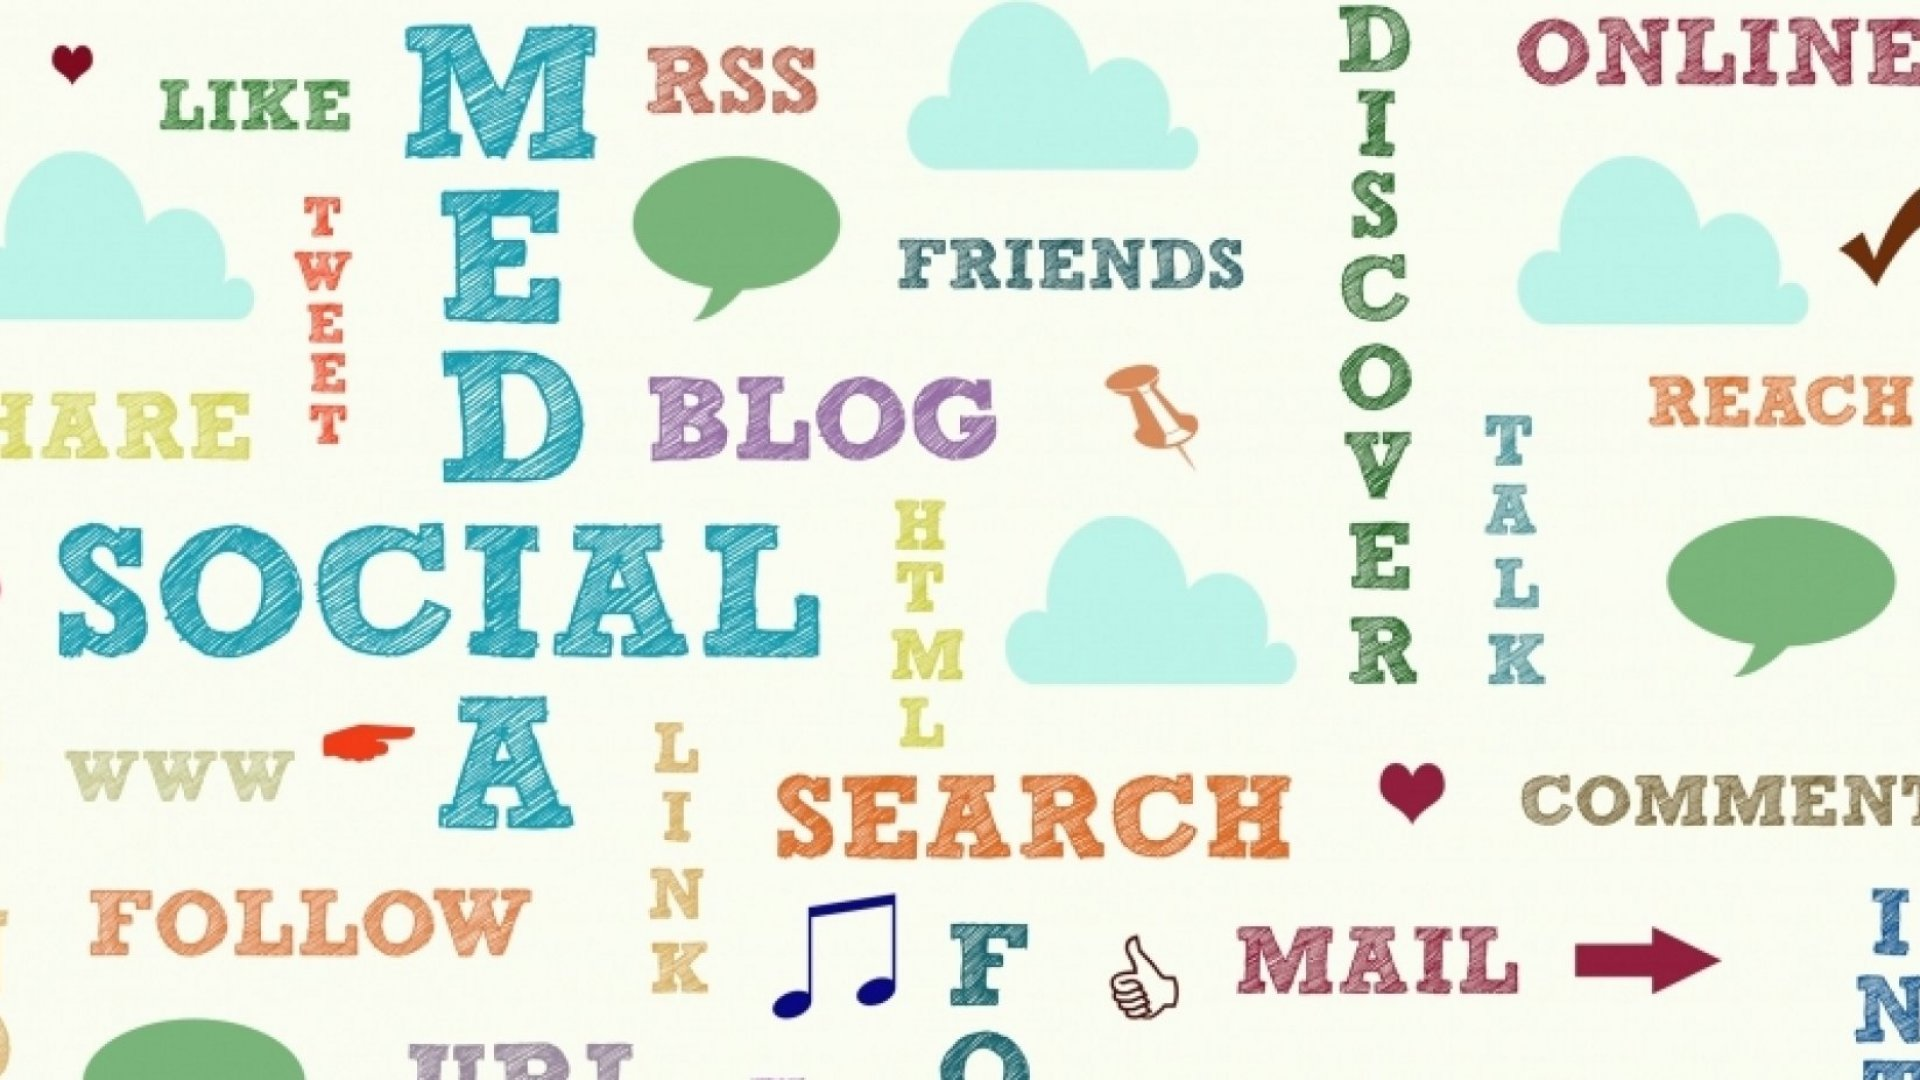 6 Incredibly Common Ways to Botch Social Media